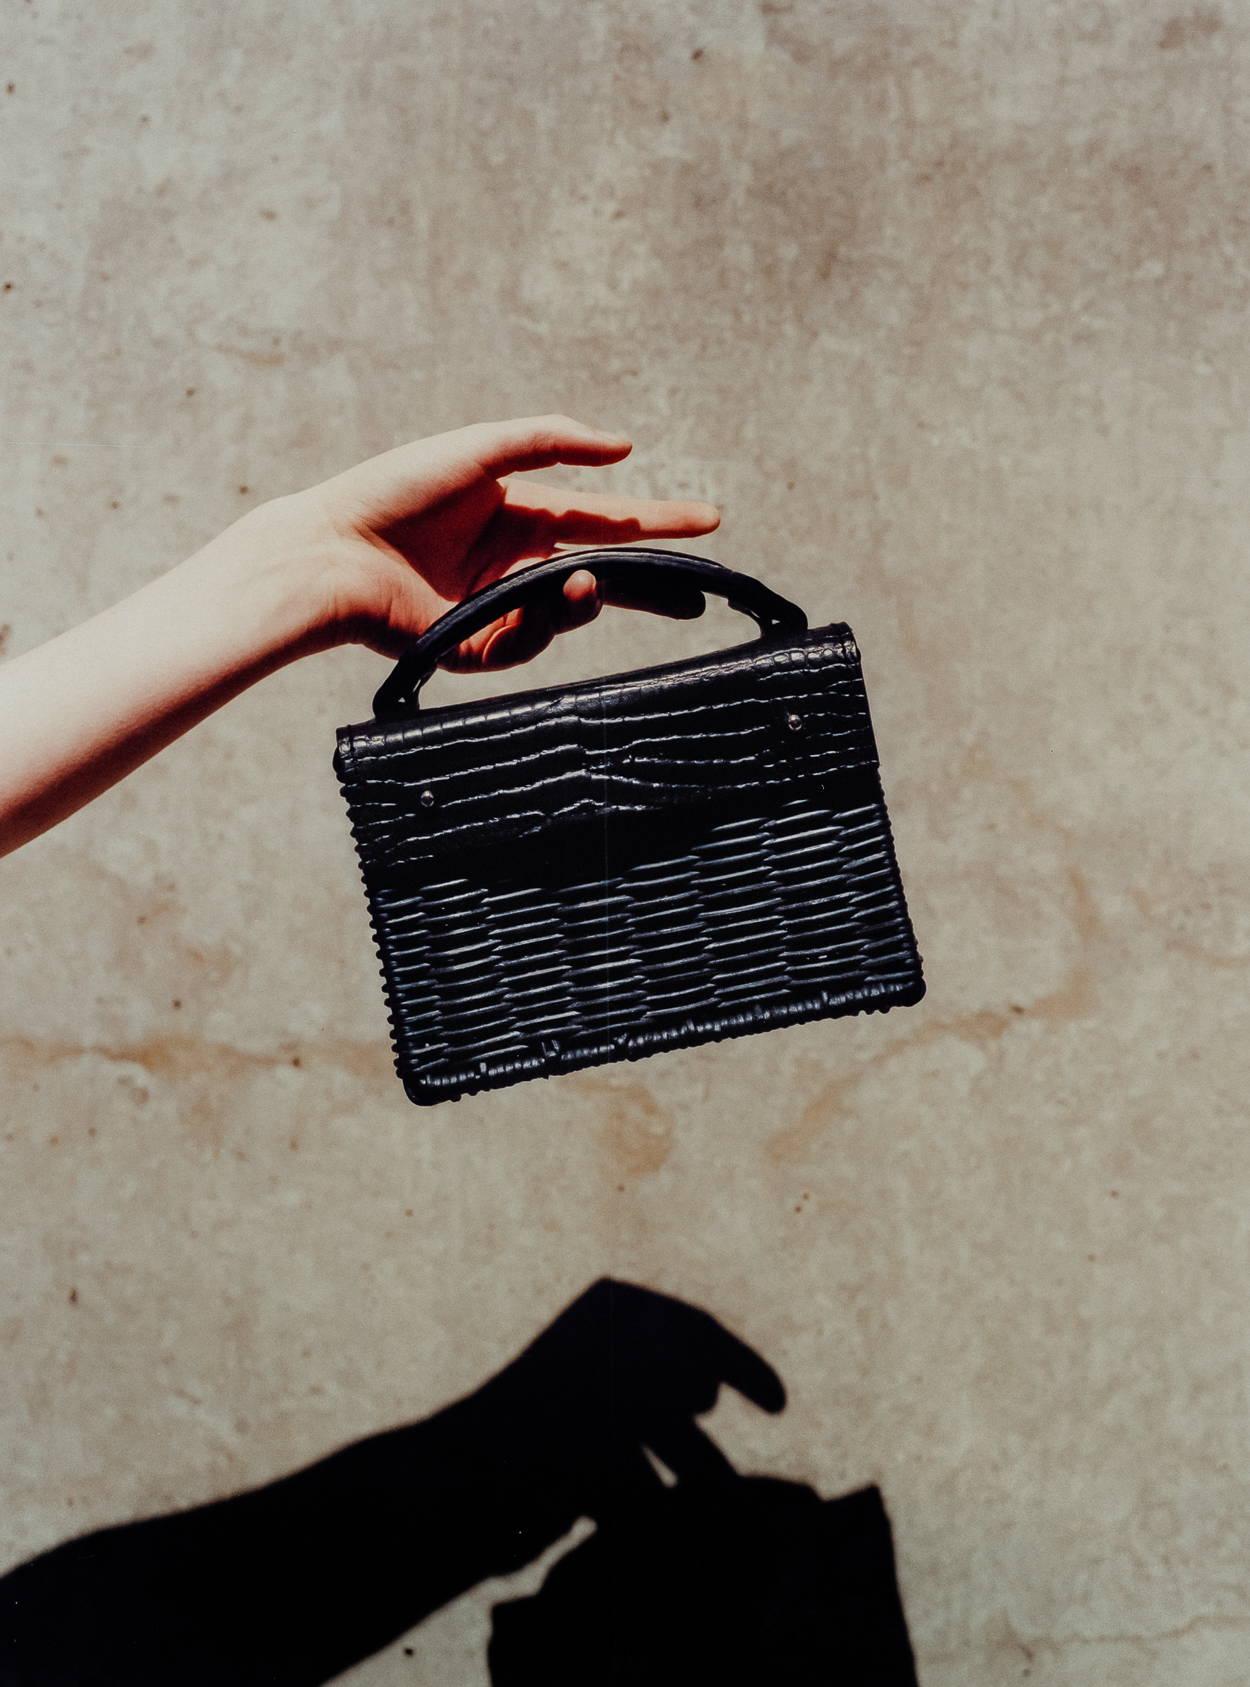 Black Mini Kuai, Wicker Bag, Rattan Bag, Eco Friendly Bag, Wicker Wings, Wicker Wings Bag